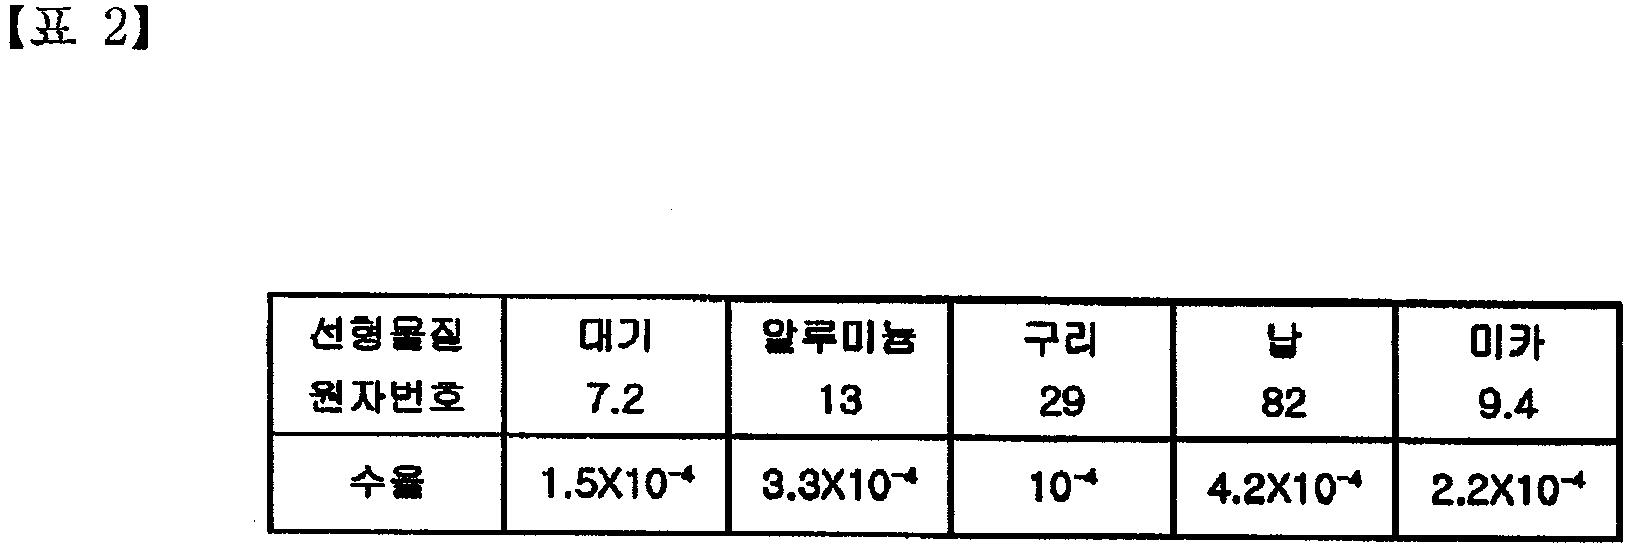 Figure 112000521634713-pat00002